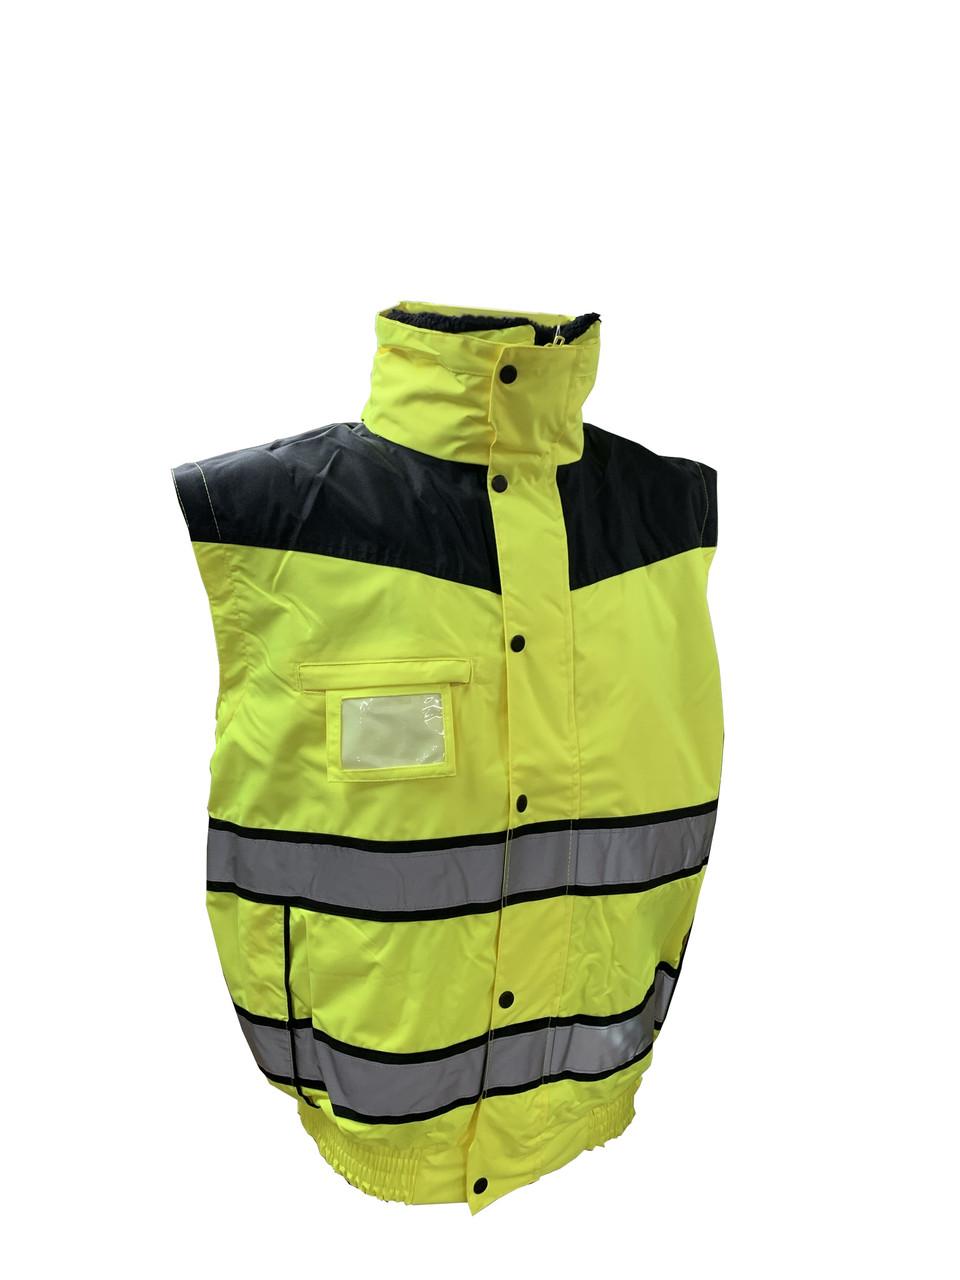 Hi-Vis Classic Bomber Jacket - Hi-Vis Yellow ## UC466YBR ##